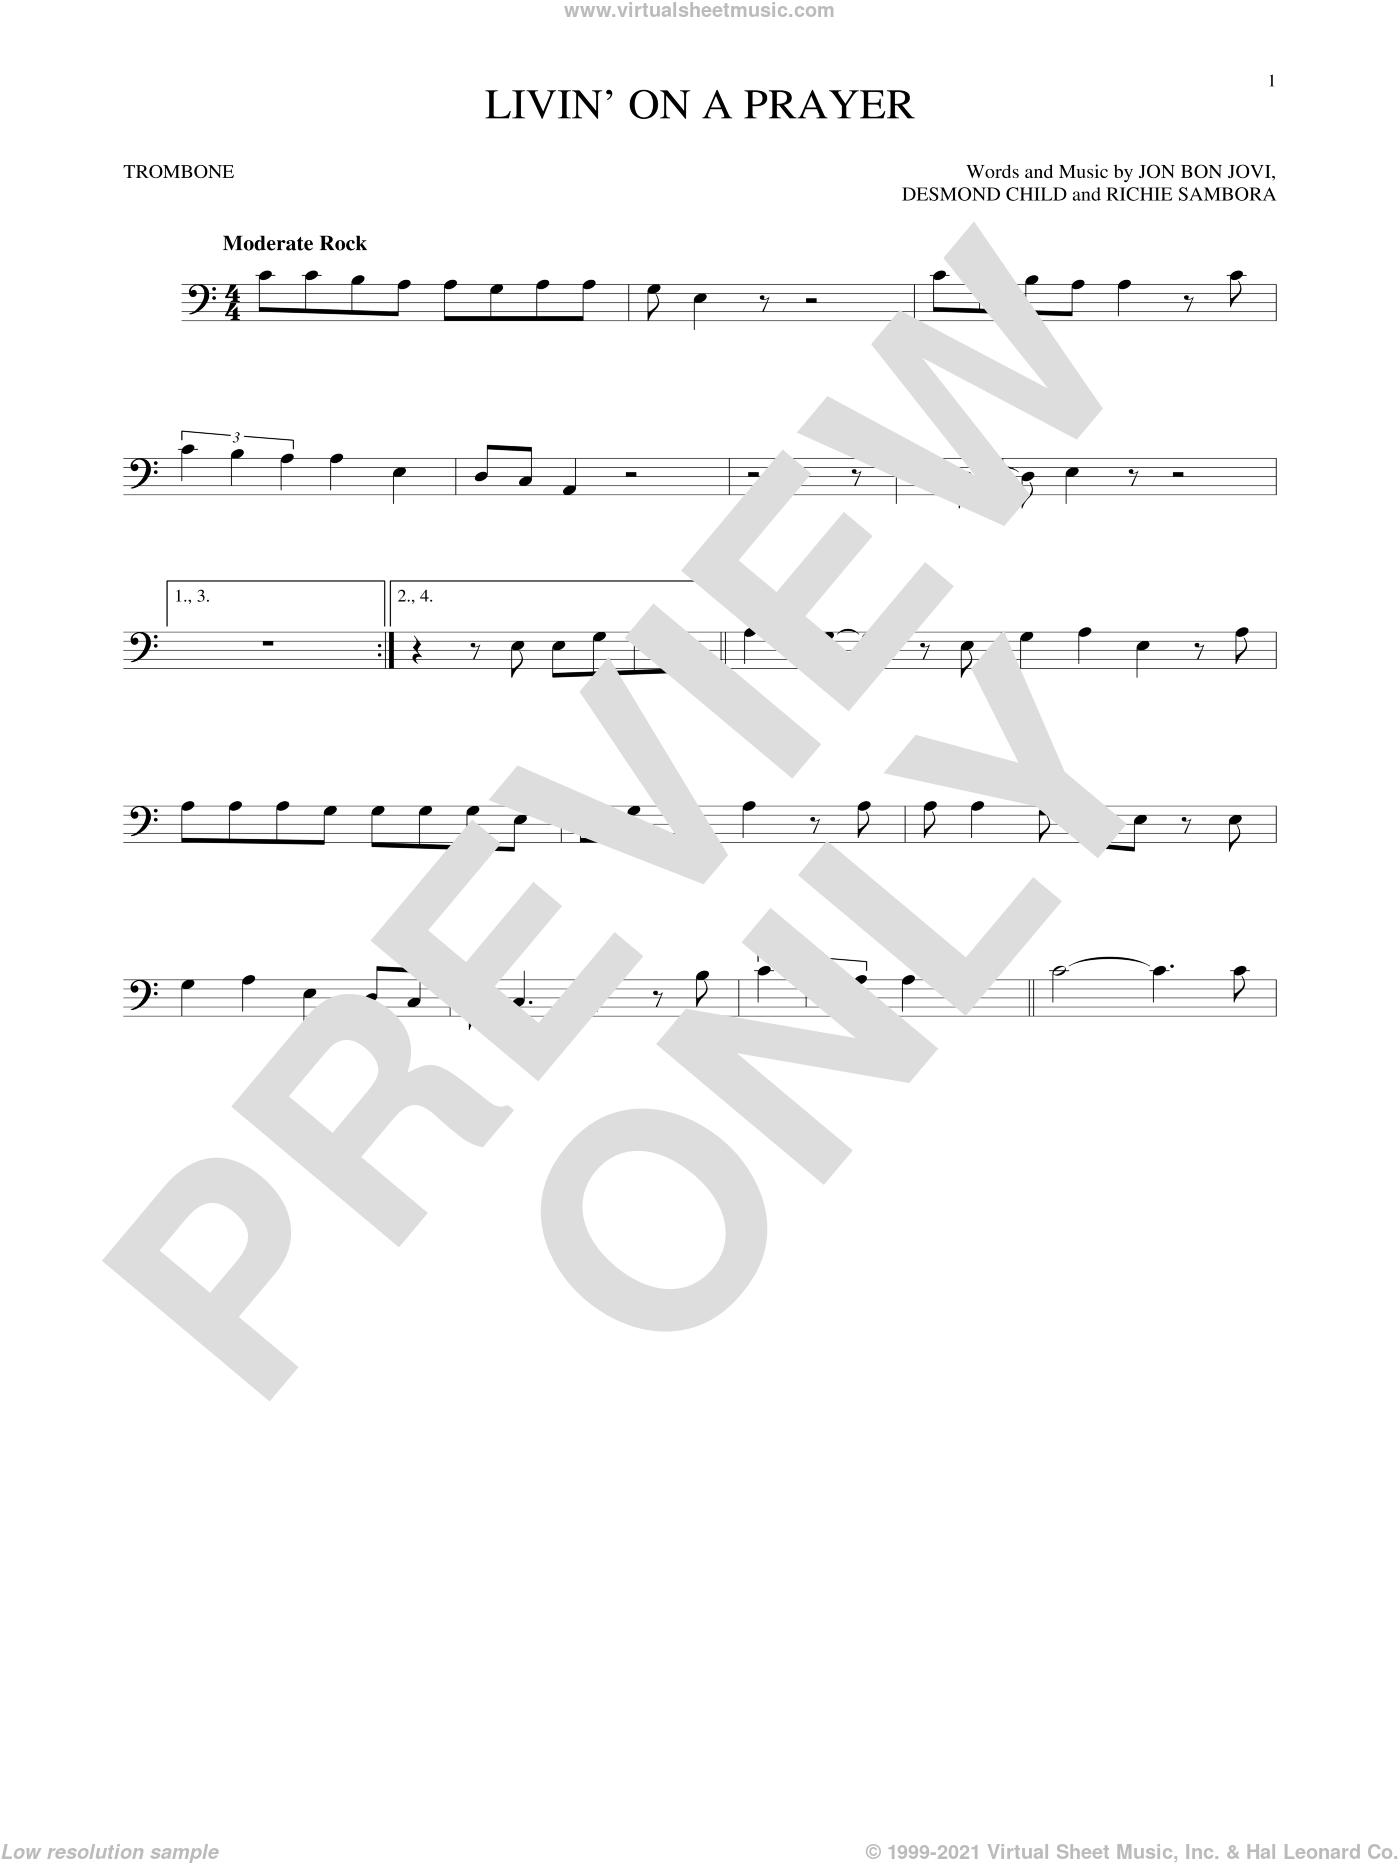 Livin' On A Prayer sheet music for trombone solo by Bon Jovi, Desmond Child and Richie Sambora, intermediate skill level